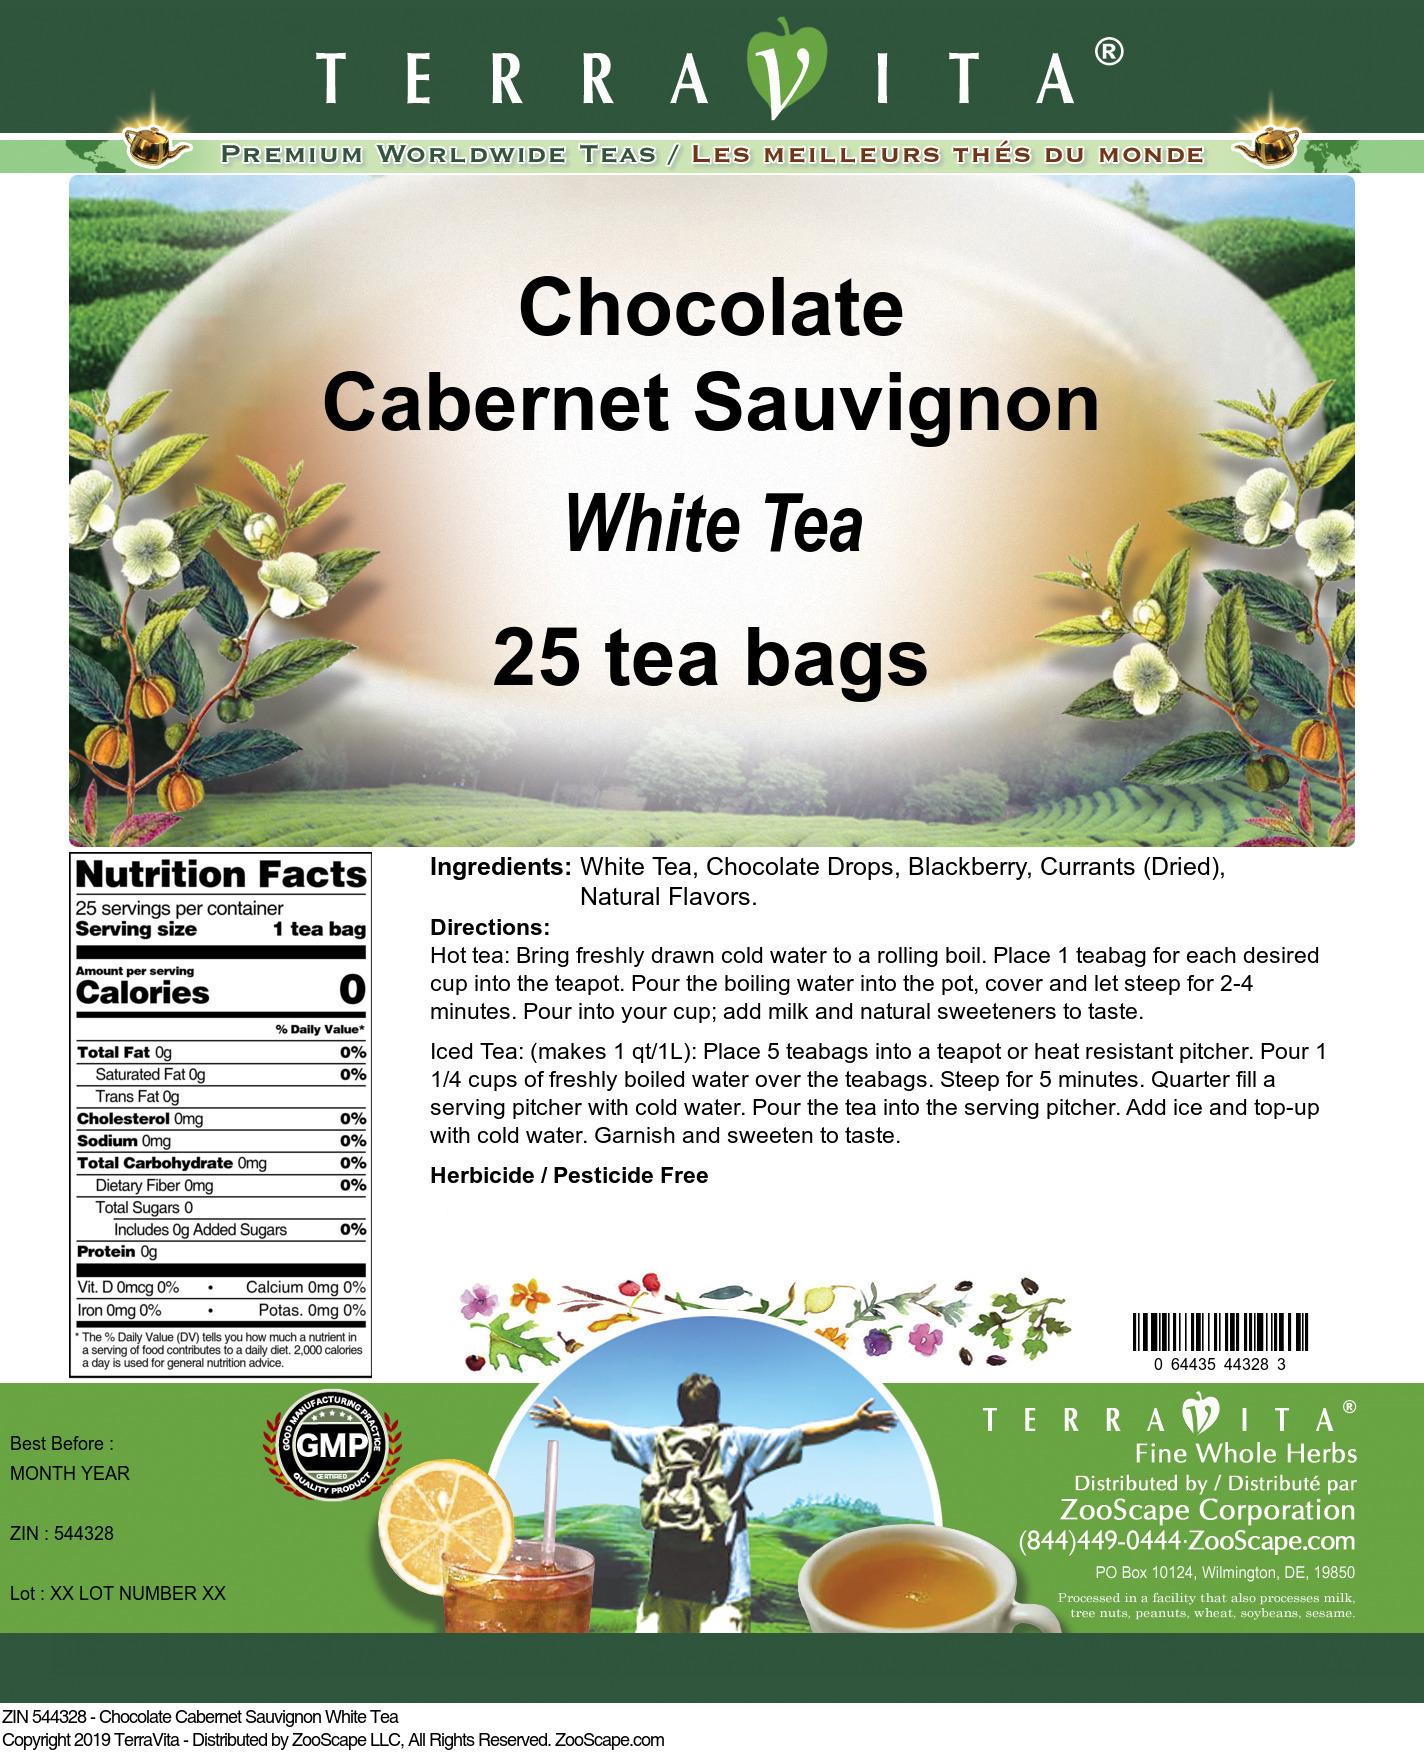 Chocolate Cabernet Sauvignon White Tea